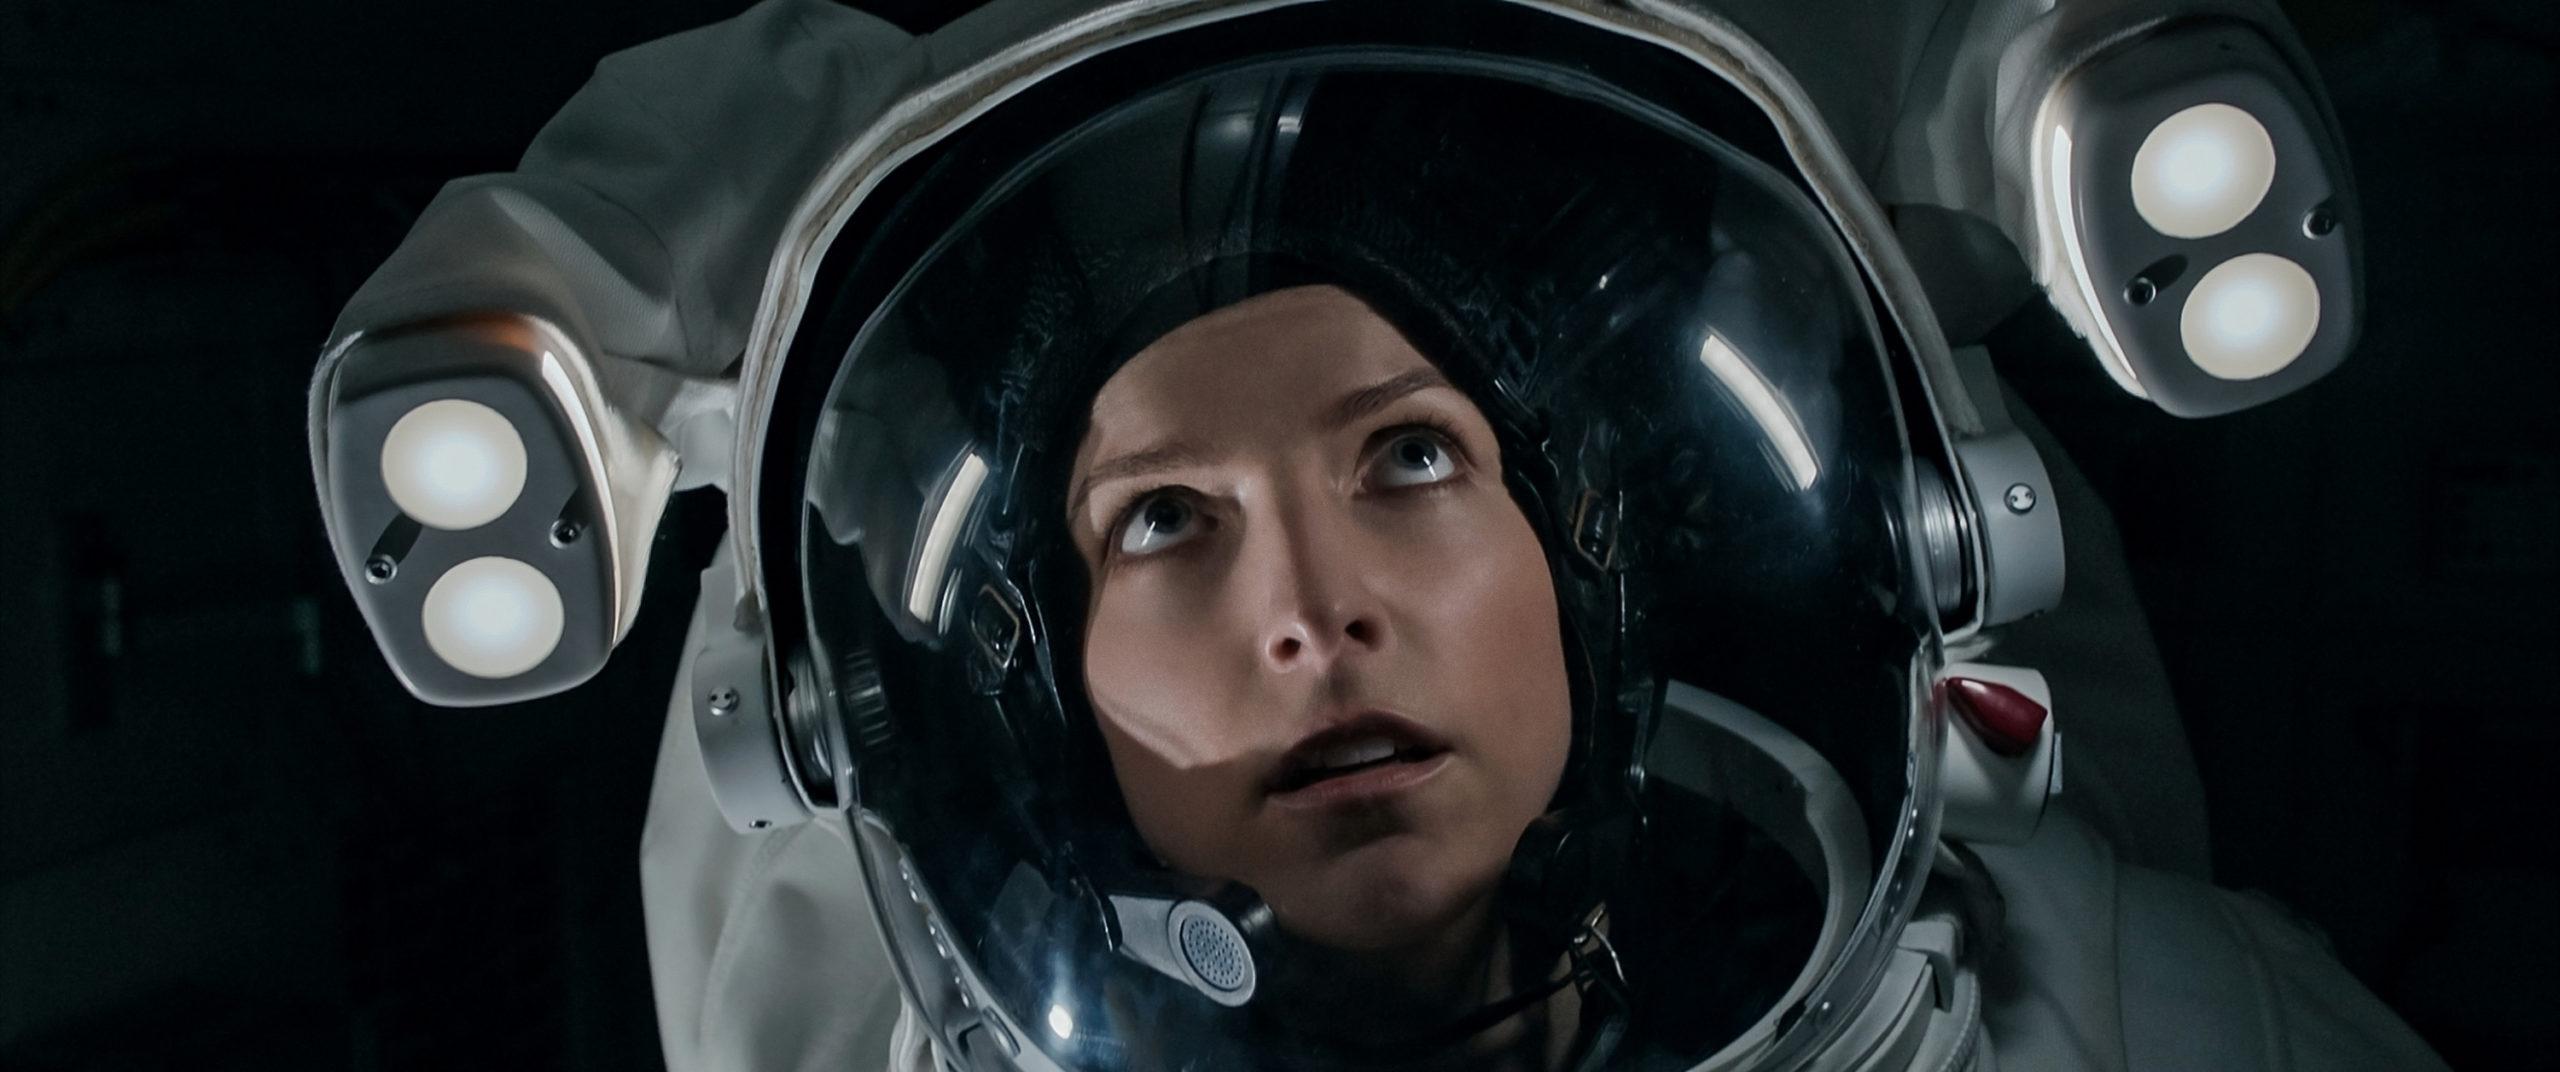 Zoe Levenson (Anna Kendrick) - Le Passager N°4